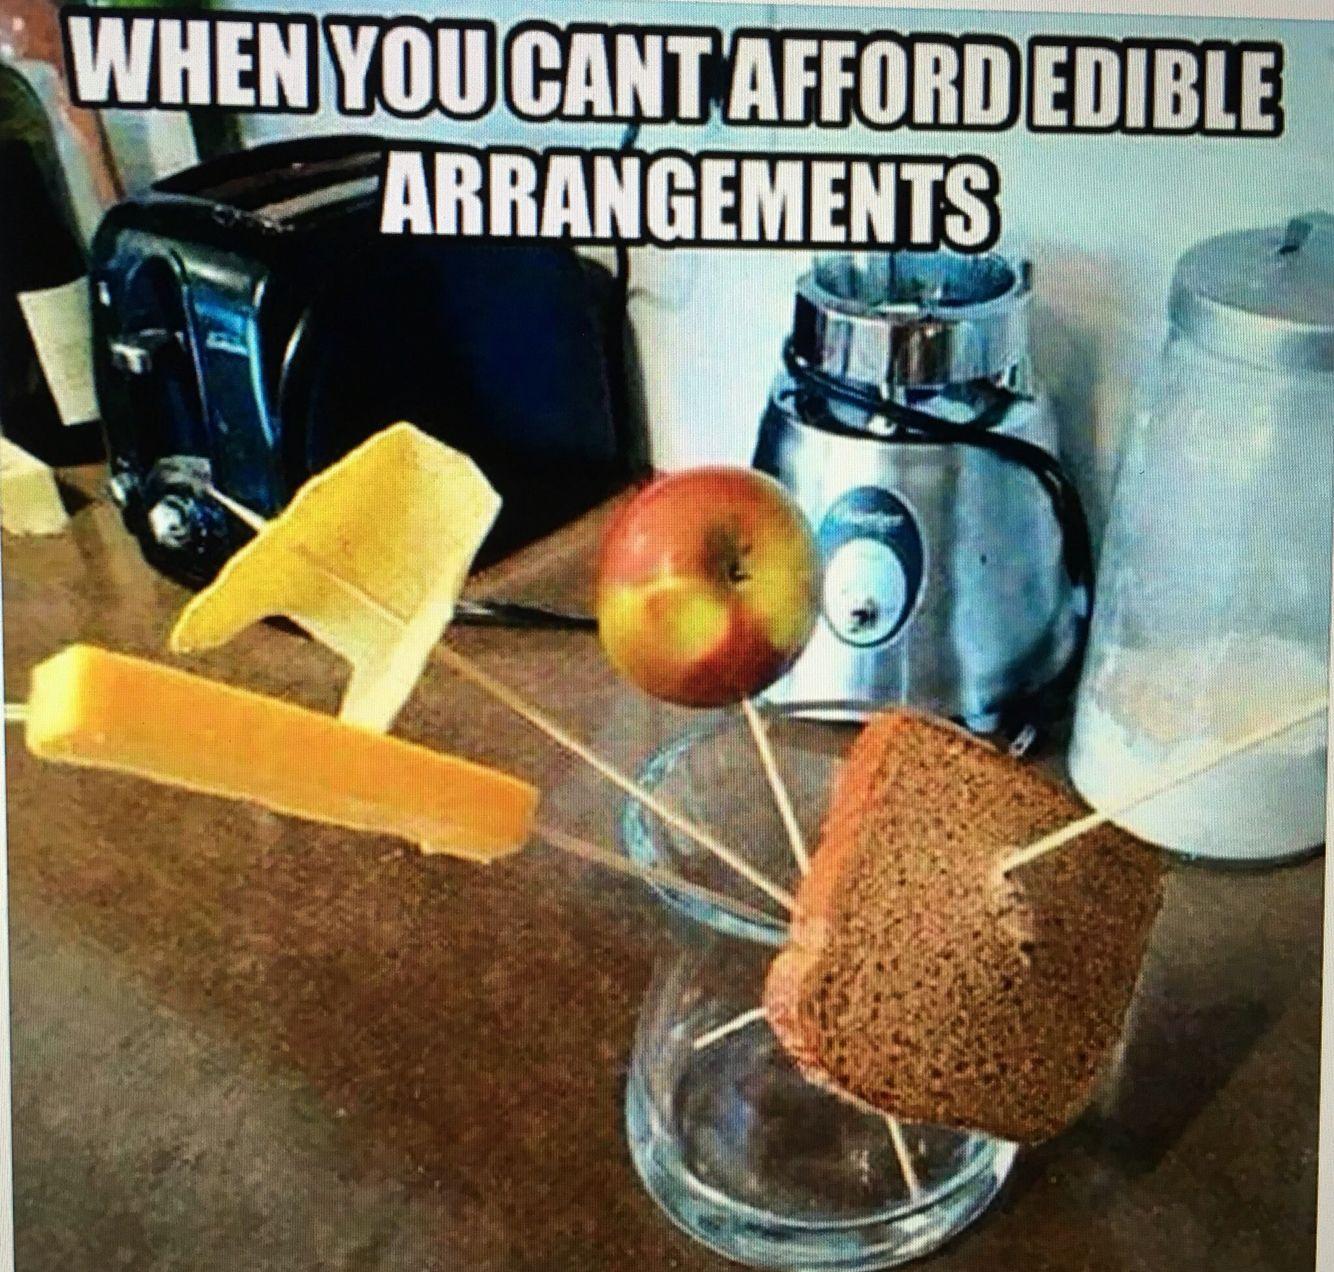 cheap edible arrangement lol truth edible cheap edible arrangement lol